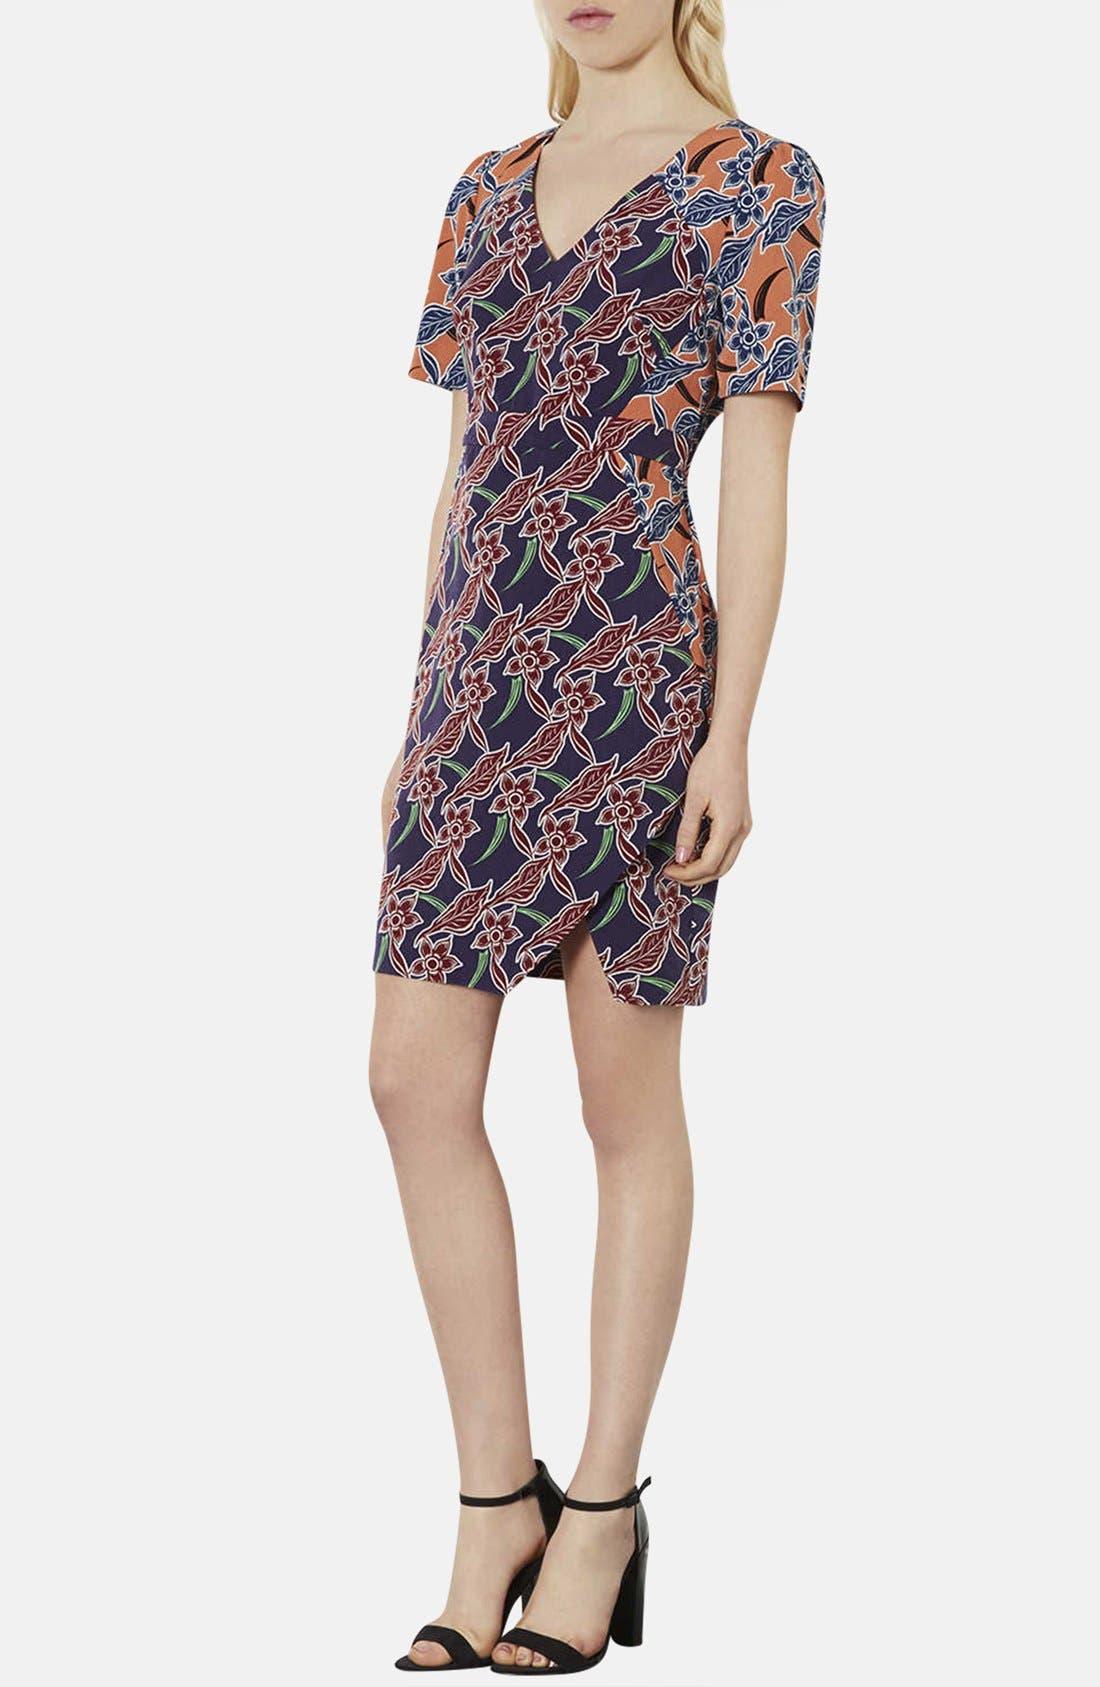 Alternate Image 1 Selected - Topshop 'Cocktail Mix' Tropical Print Tea Dress